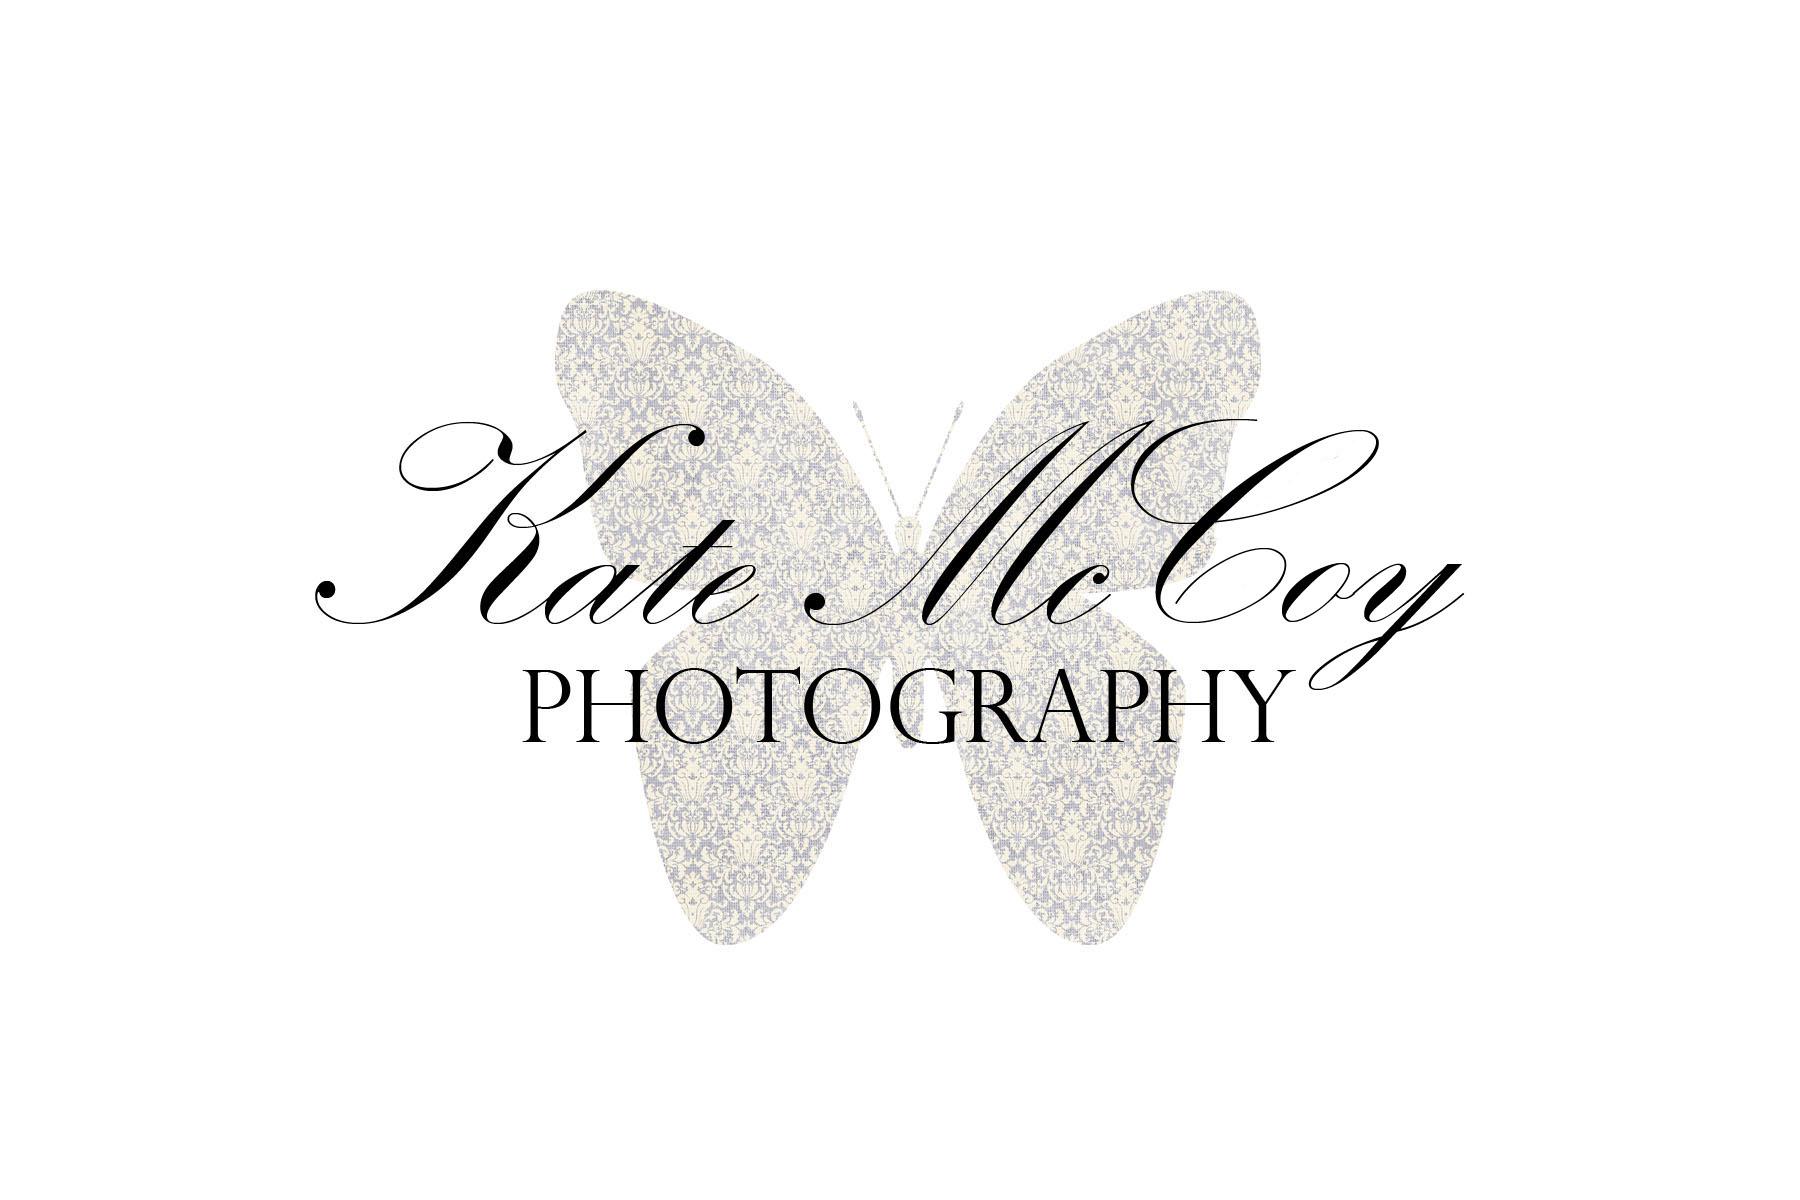 Kate McCoy Photography